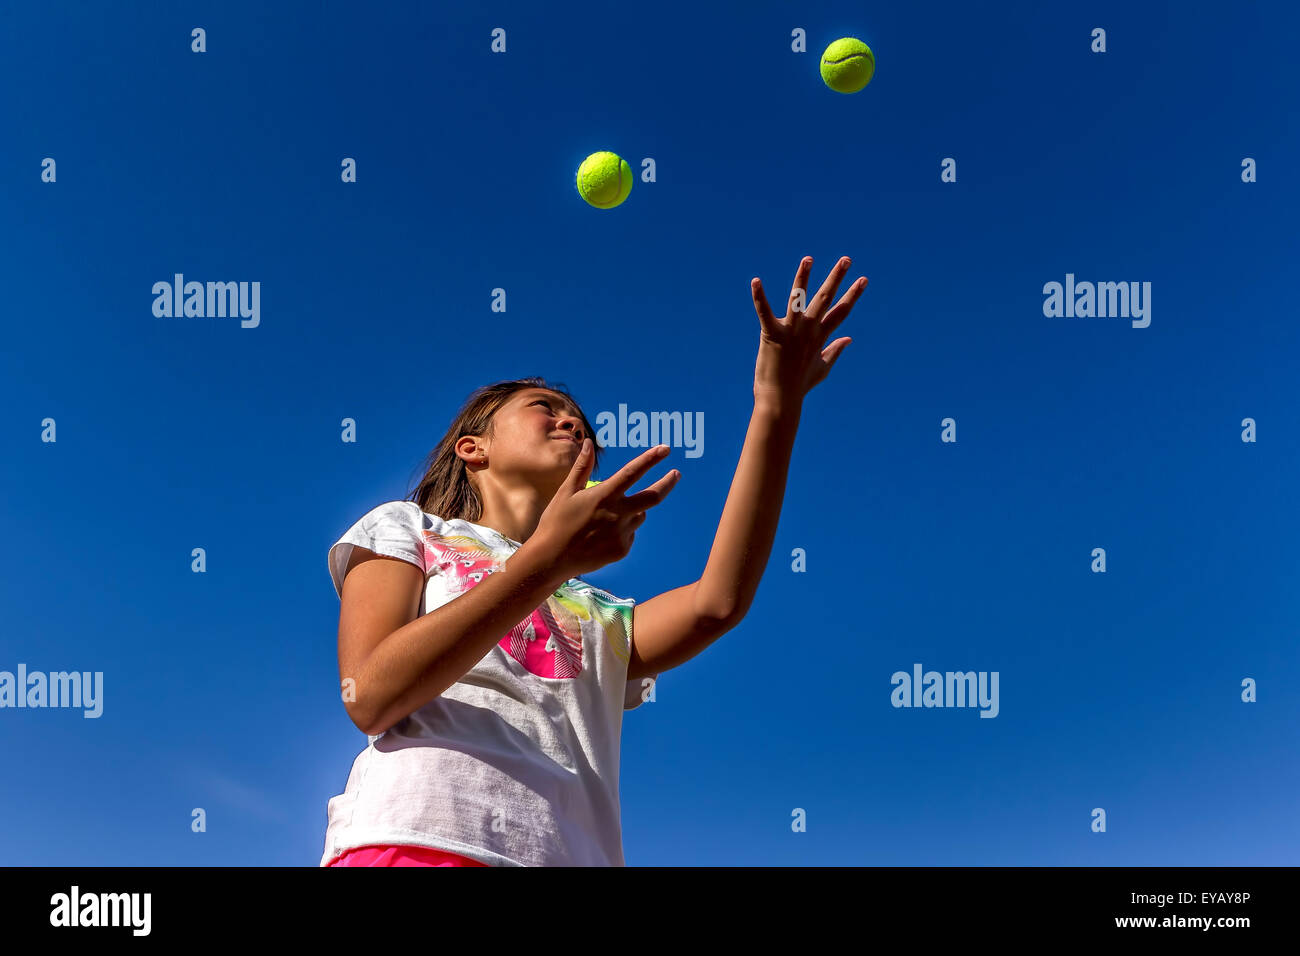 Looking up at girl juggling. - Stock Image